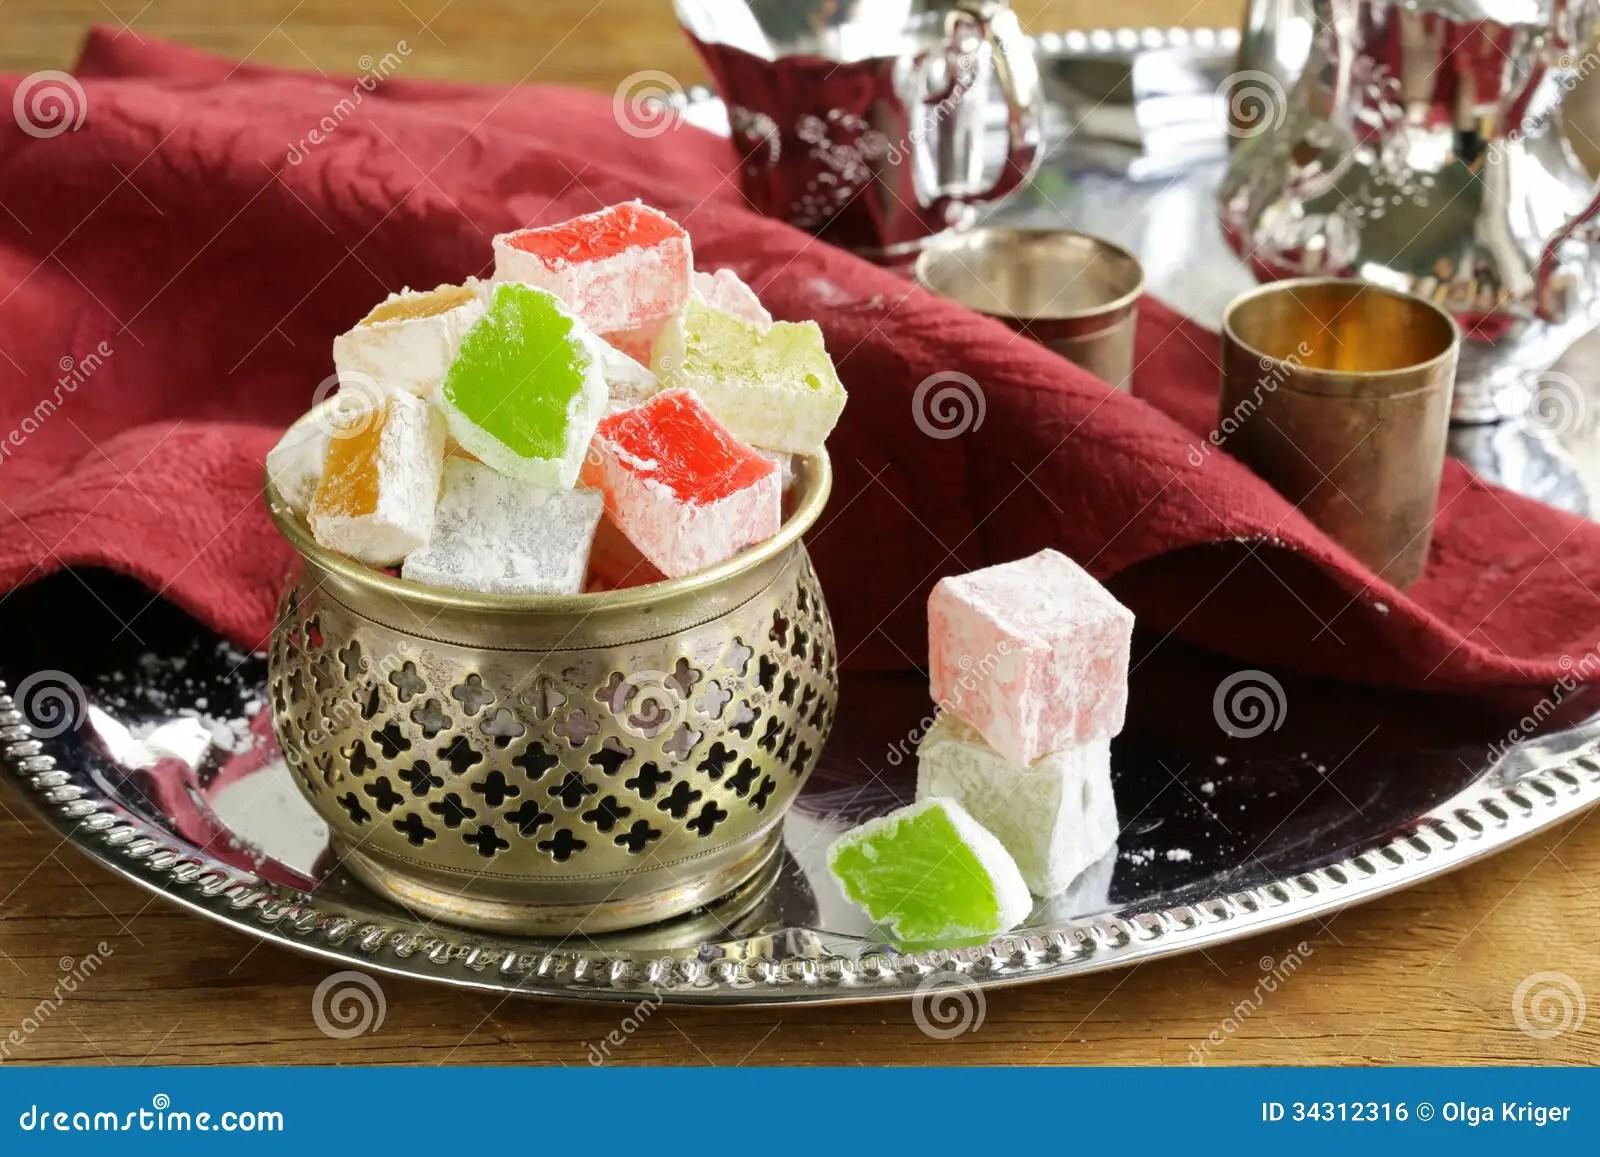 Turkish Delight Dessert Rahat Lokum Royalty Free Stock